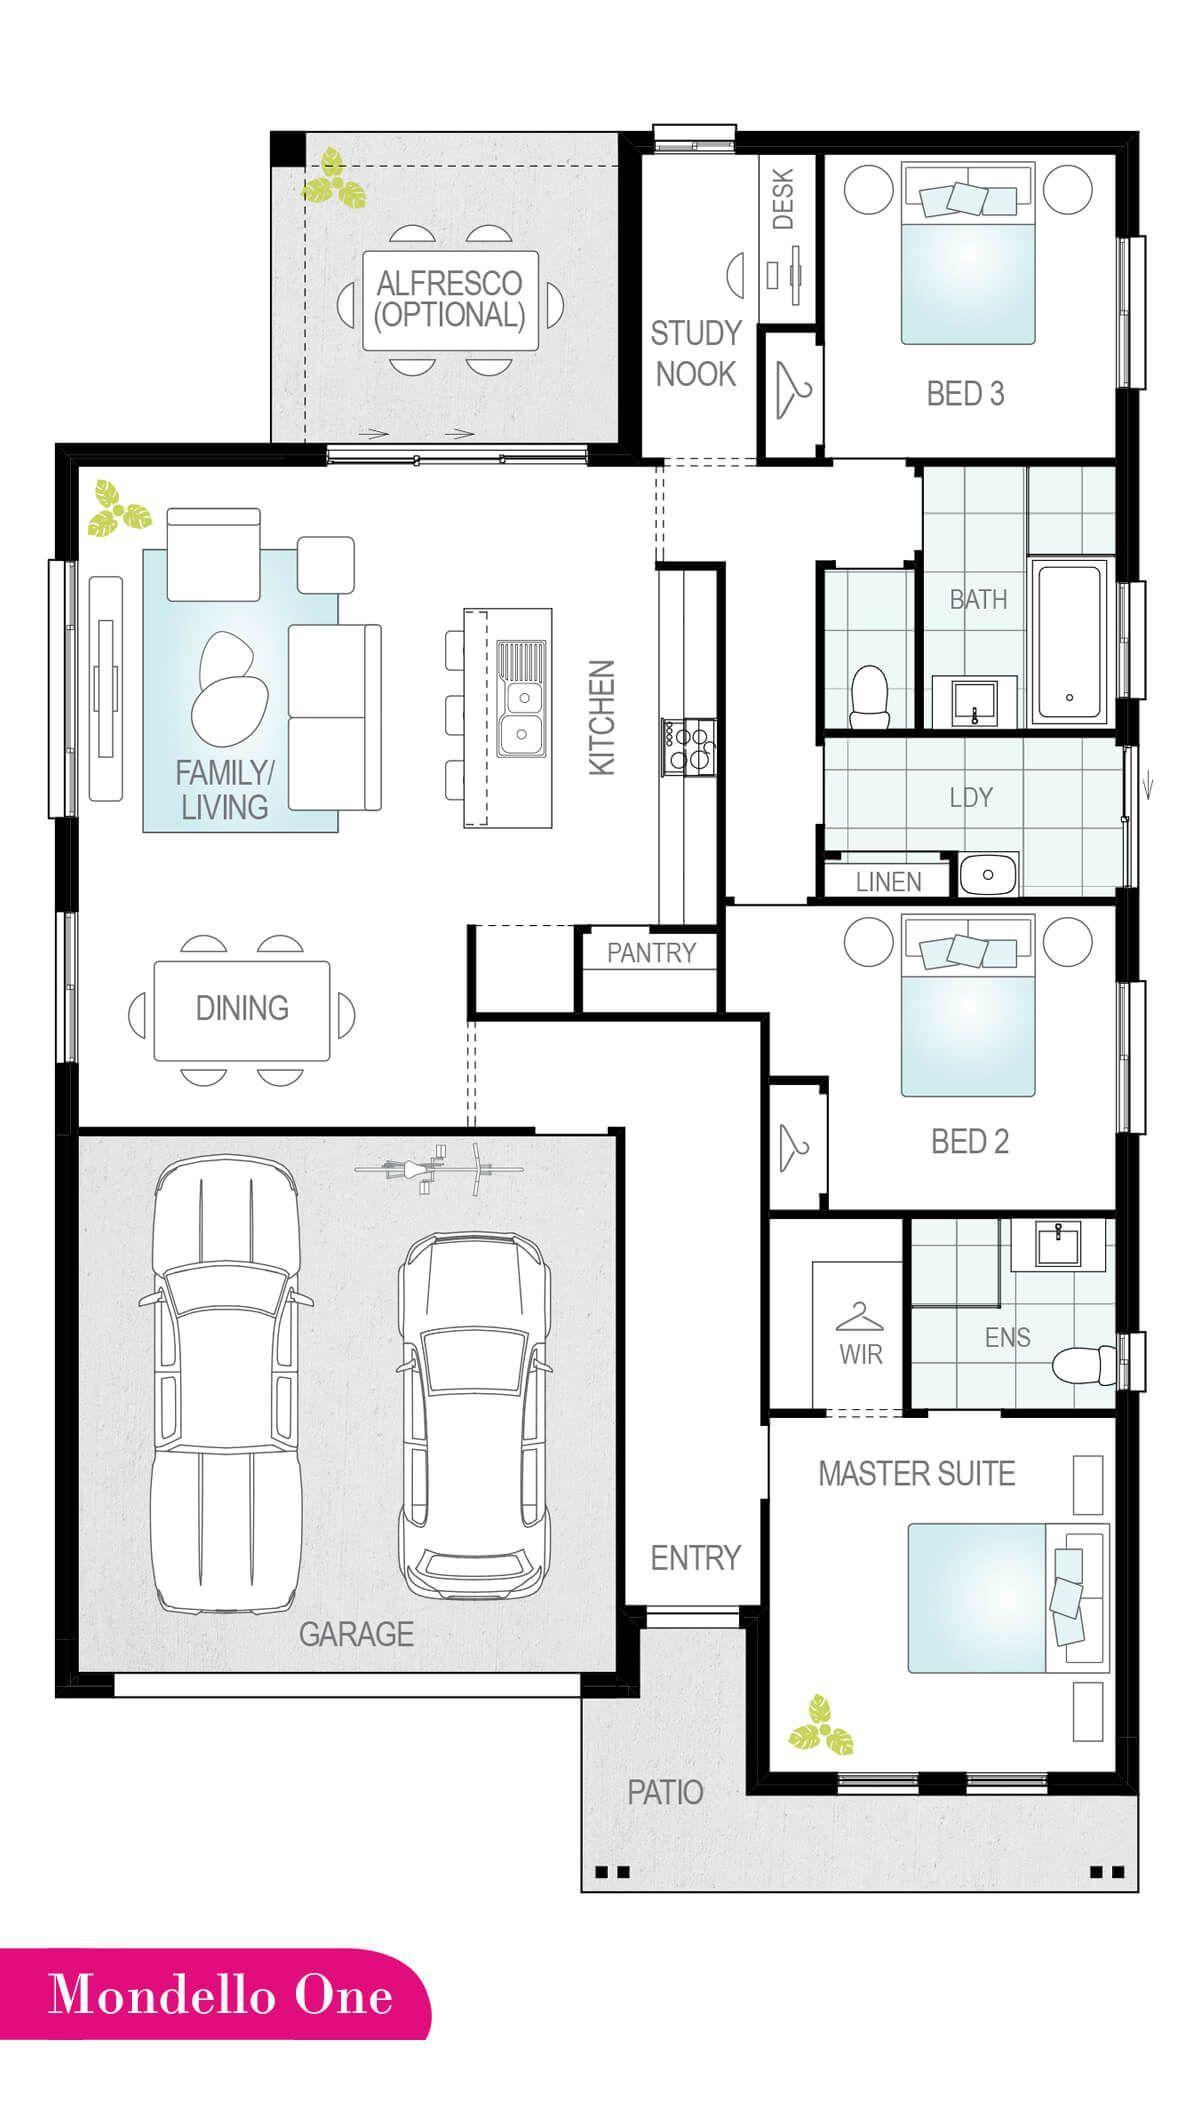 Brand New House Plans 2021 New House Plans House Plans Home Design Floor Plans